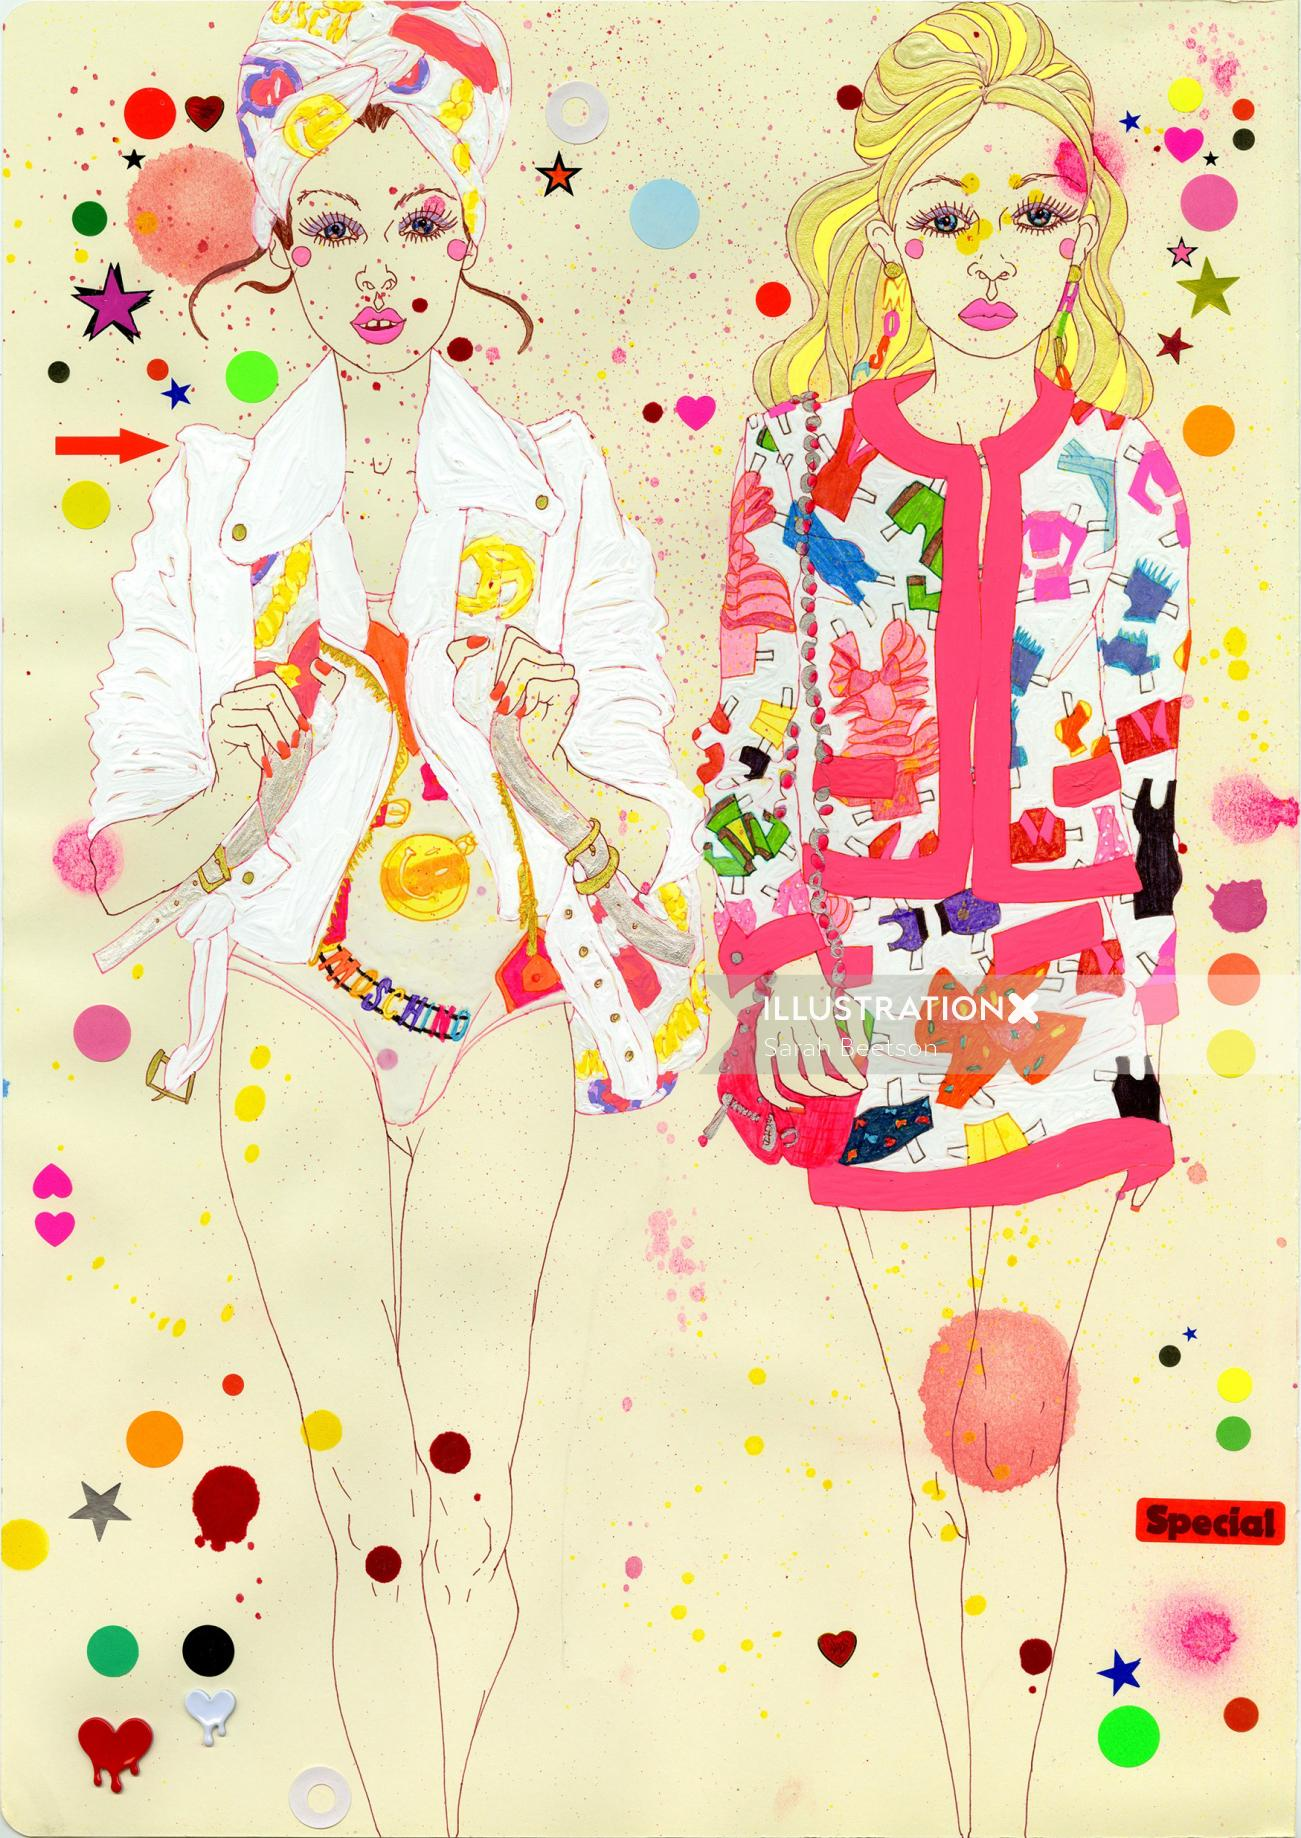 Women fashion illustration by Sarah Beetson